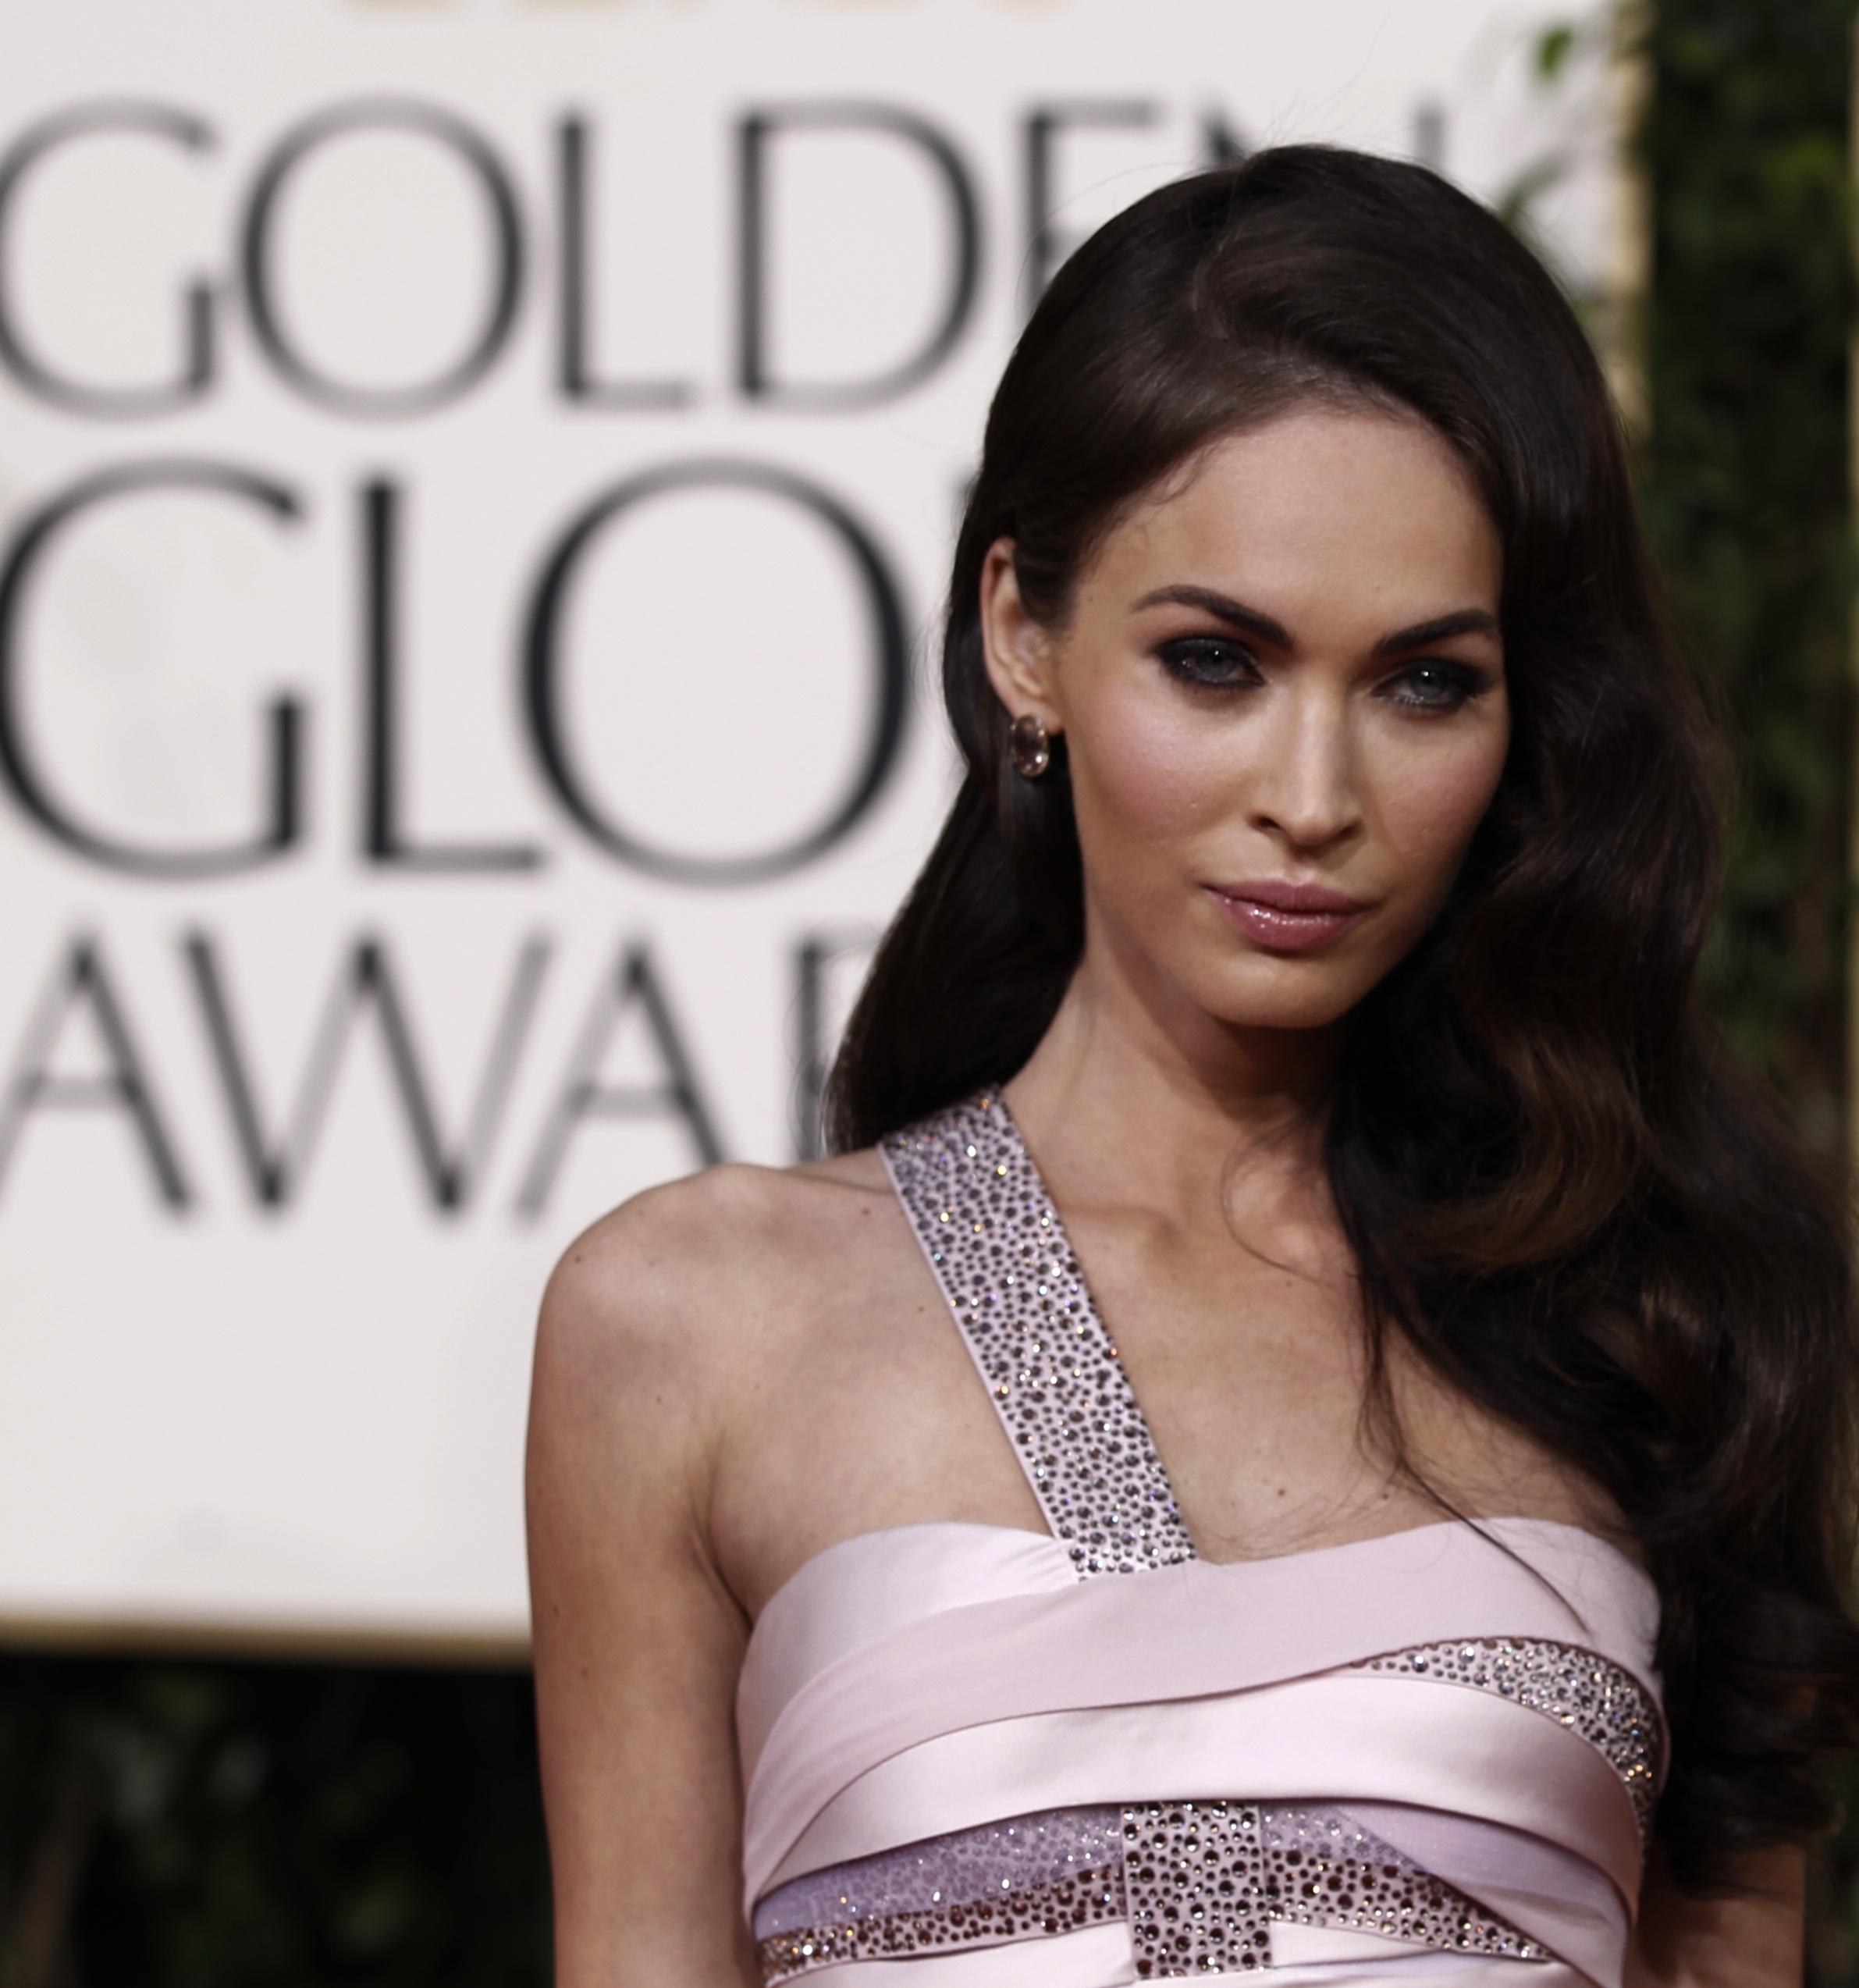 31308_megan_fox_at_the_golden_2011_globe_awards_05_122_117lo.jpg